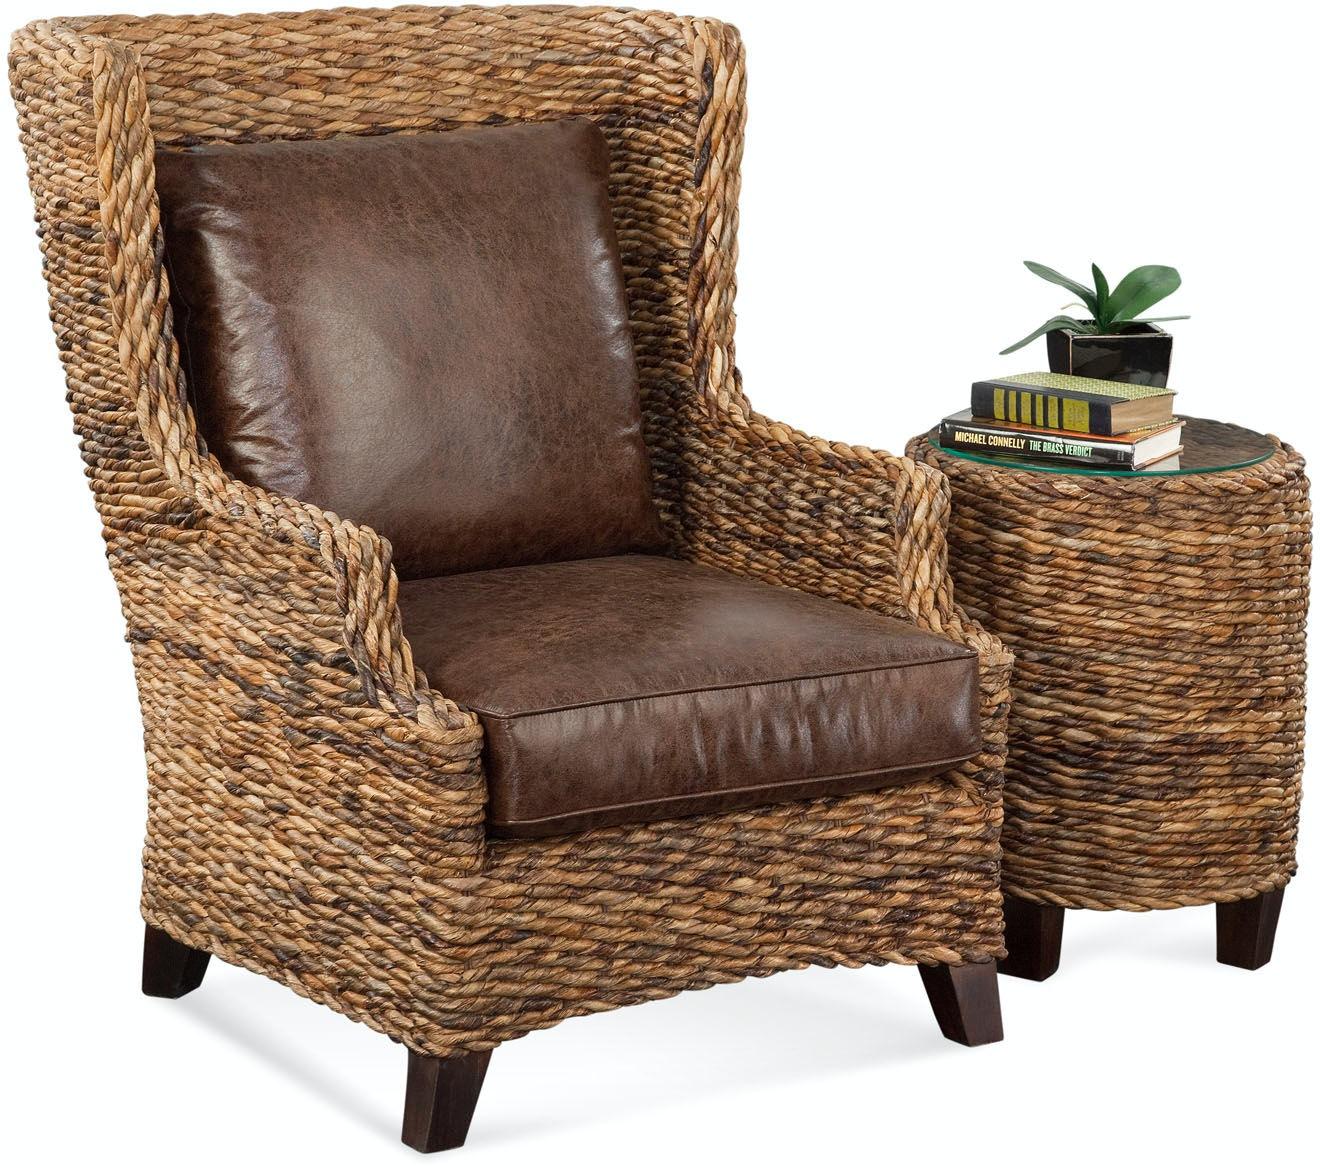 Sydney Chair 2961-007